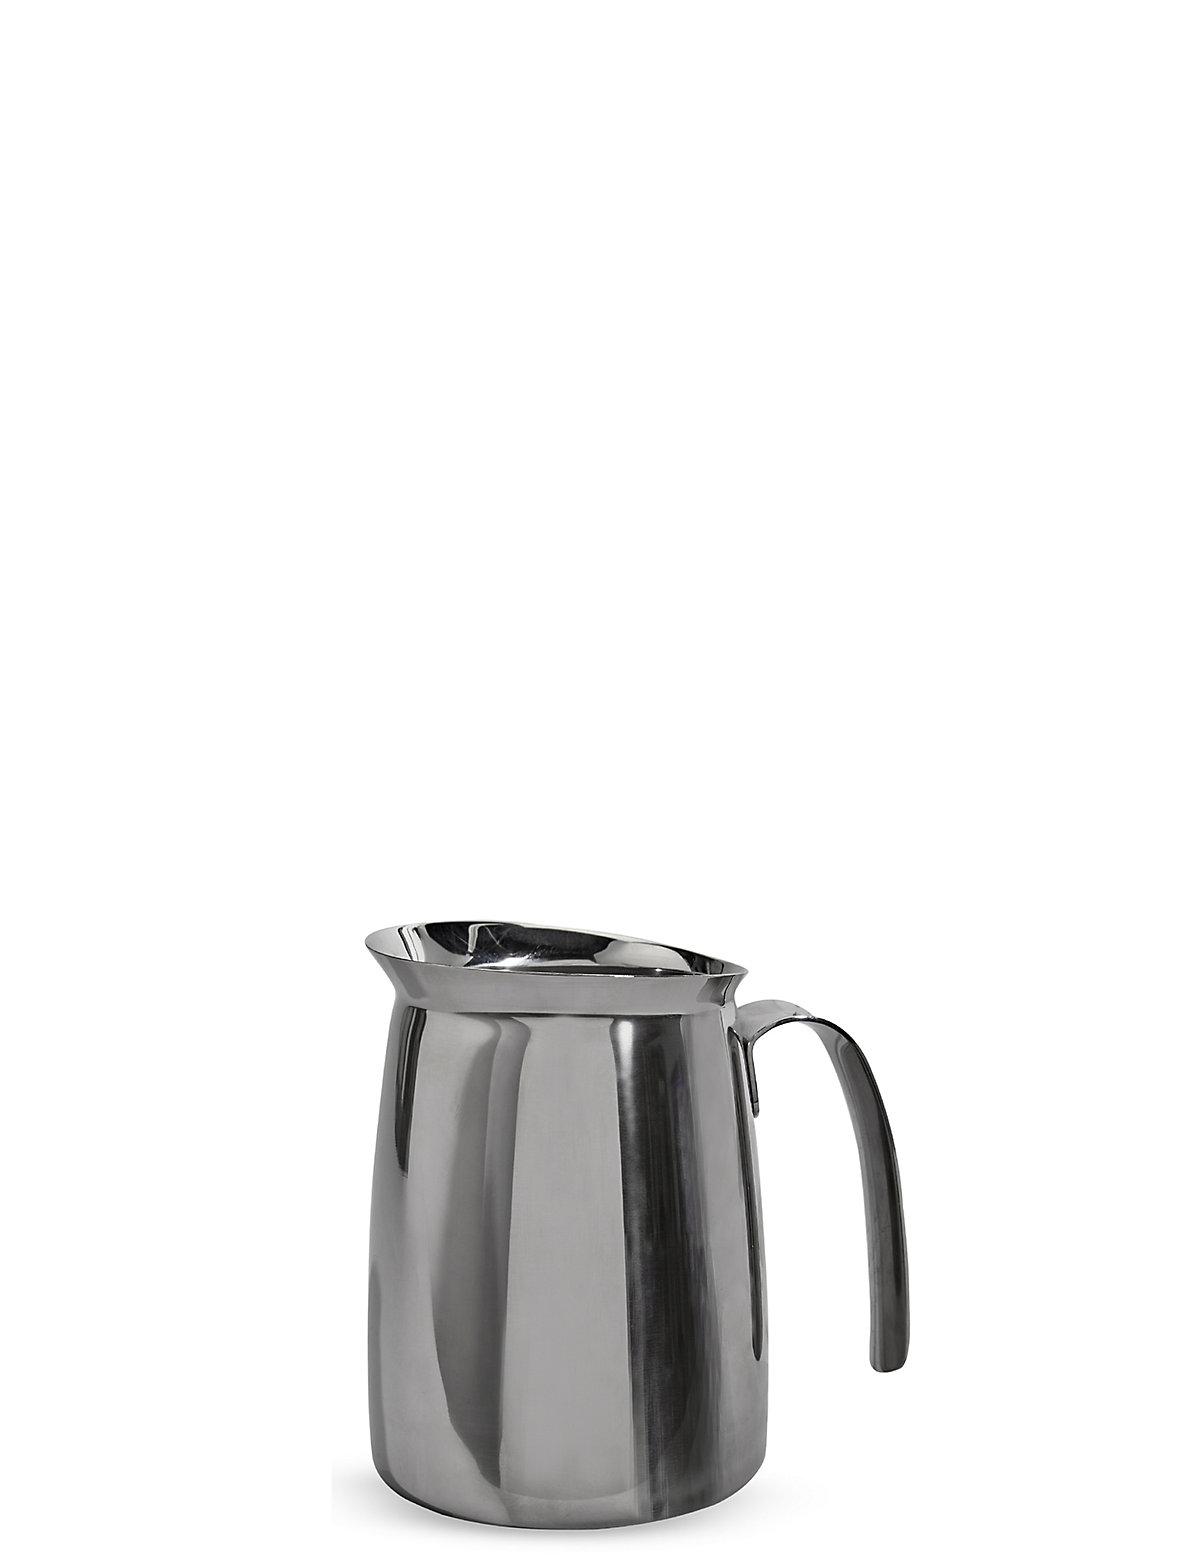 buy cheap steel milk jug compare kitchen prices for best. Black Bedroom Furniture Sets. Home Design Ideas